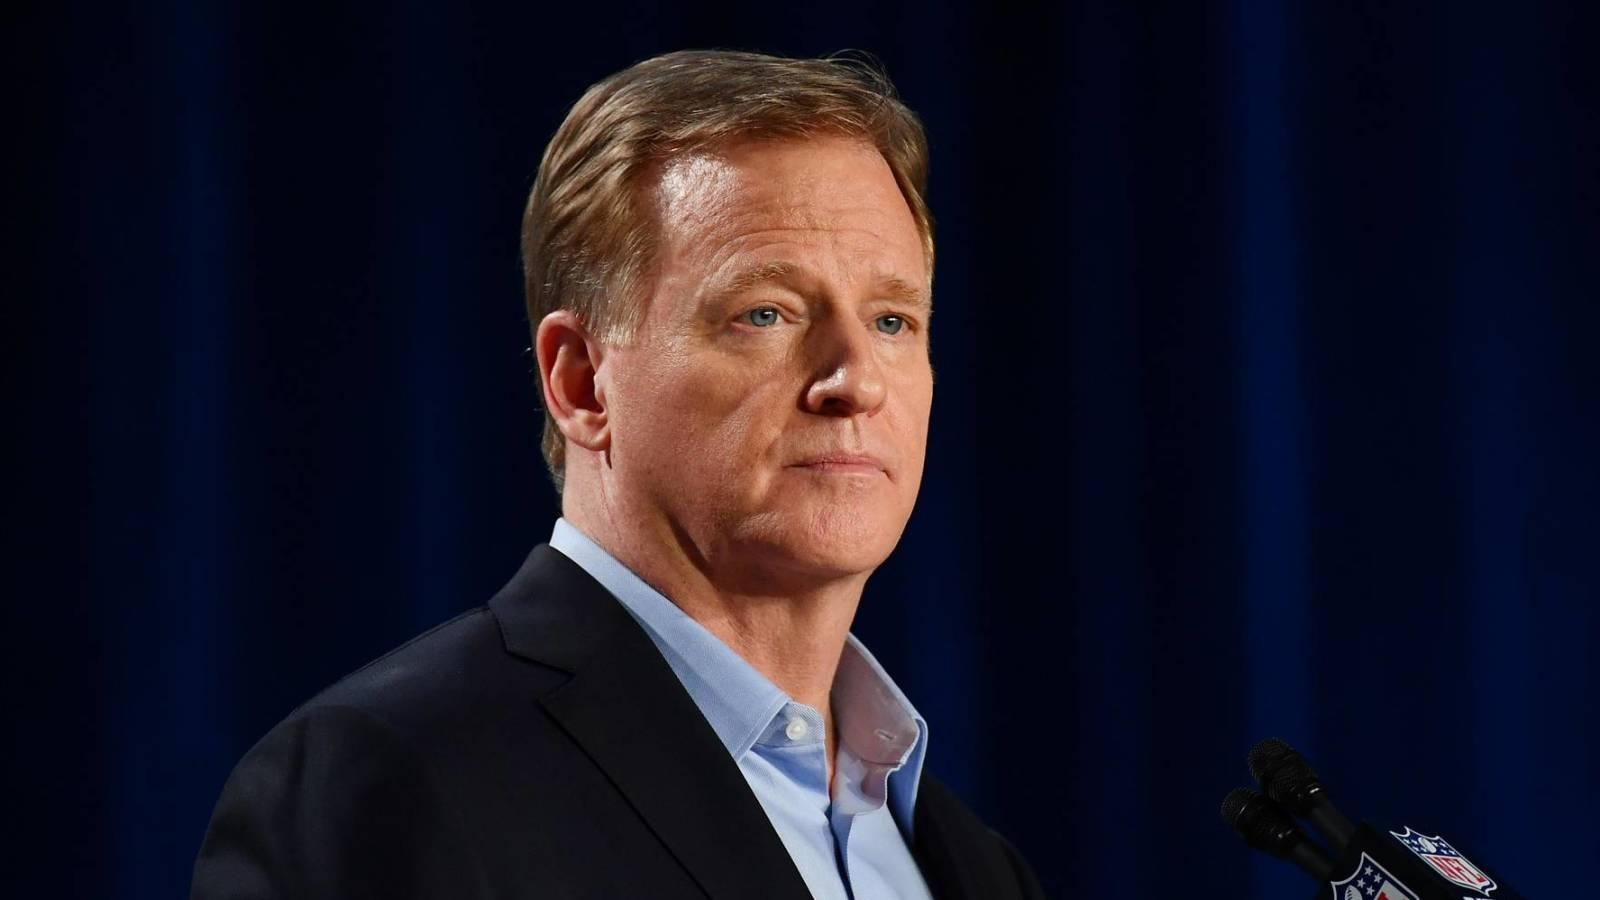 NFL under pressure to release emails from Washington investigation